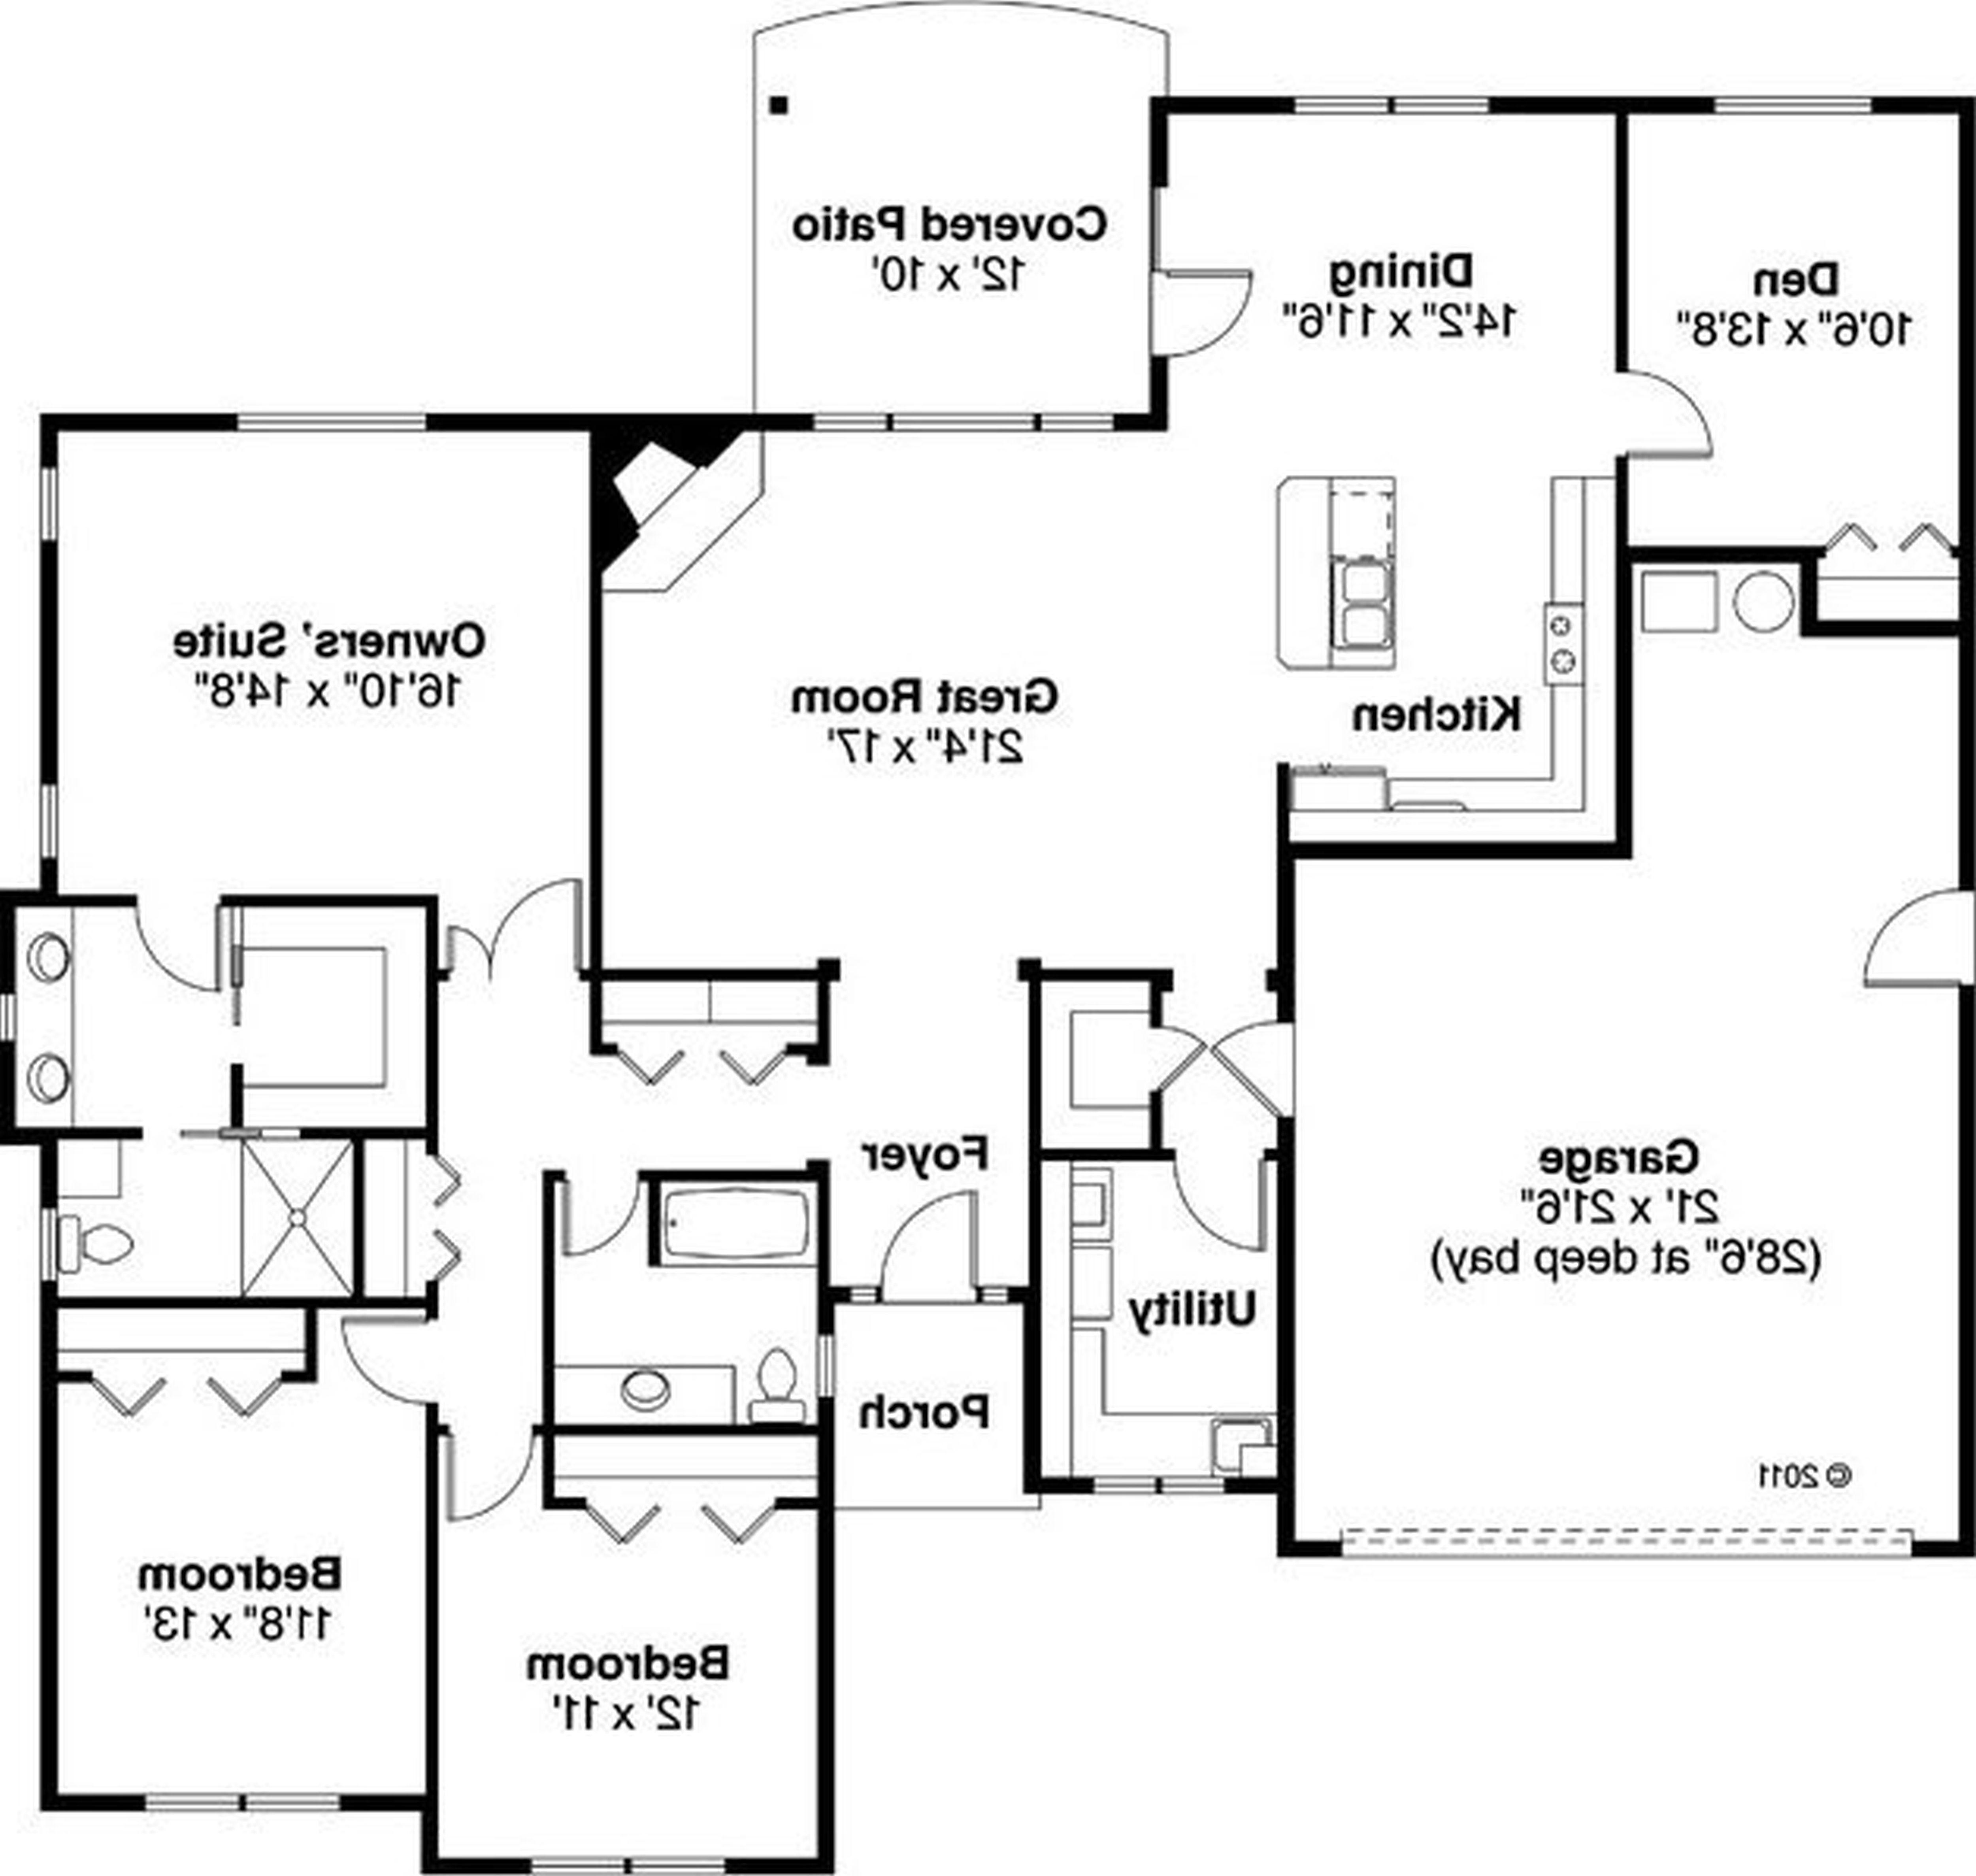 Home Decor Store Help Design Living Room Ideas And Designs